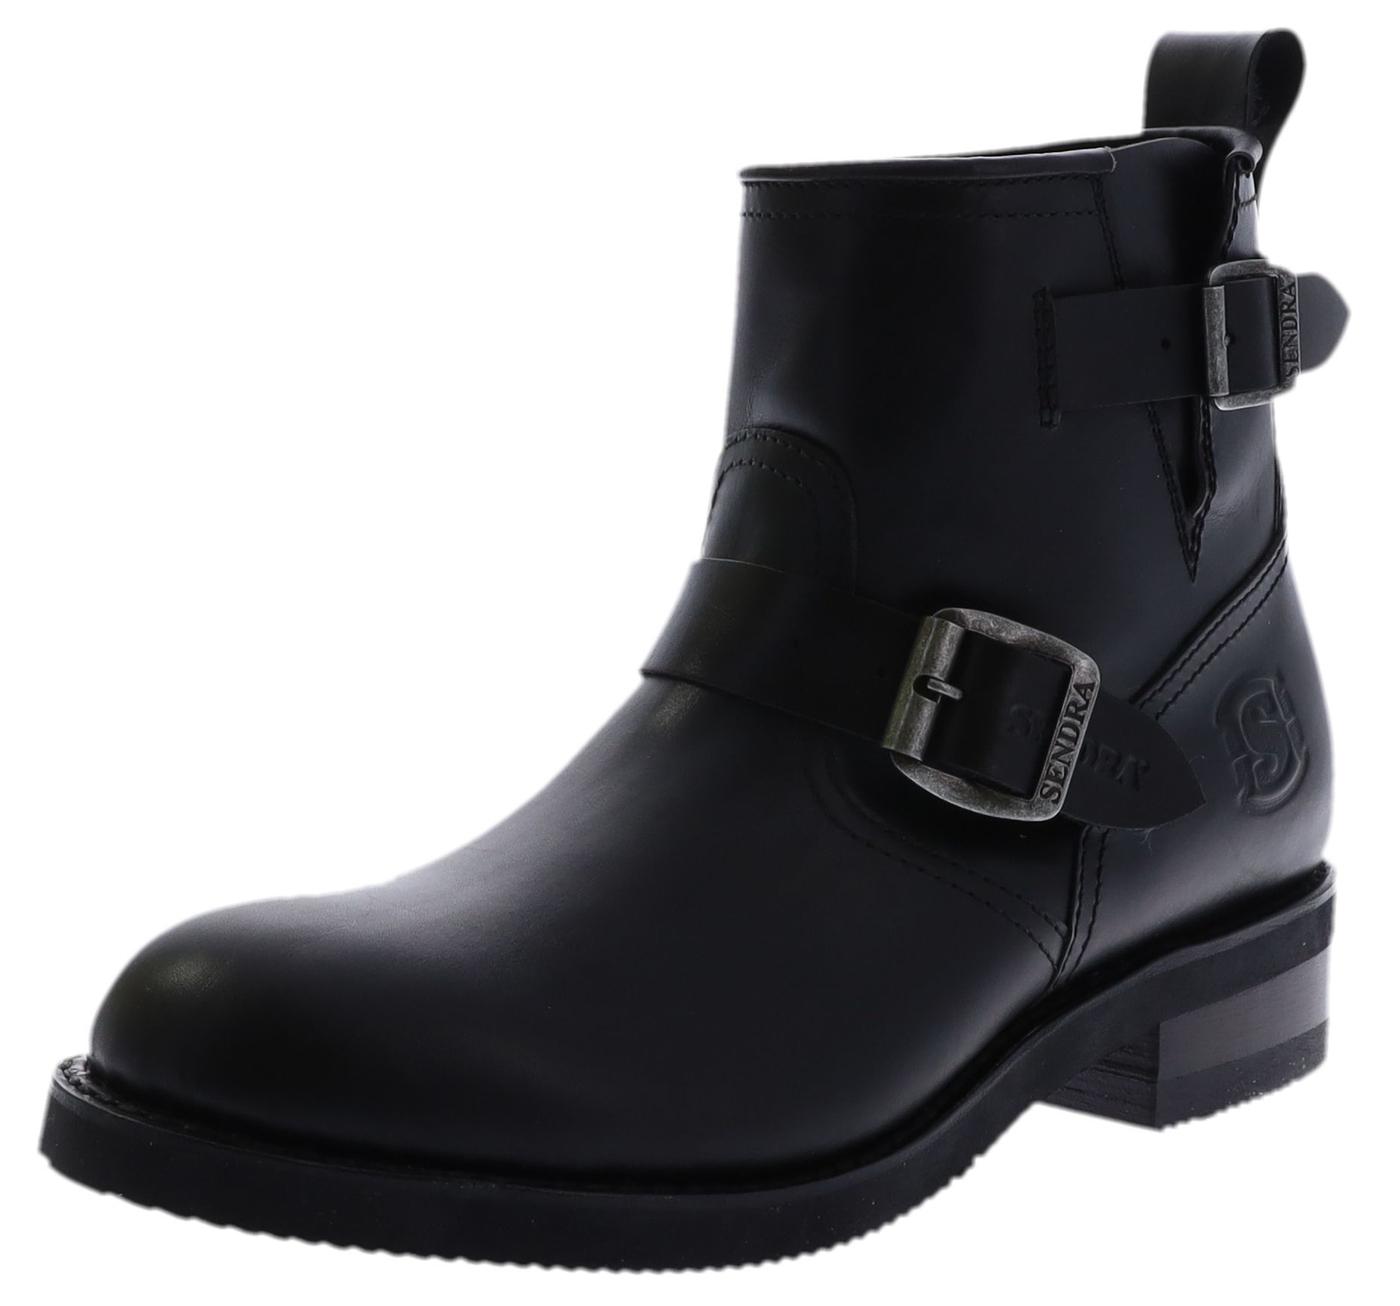 Sendra Boots 2976 Negro Engineer-Stiefelette ohne Stahlkappe - schwarz